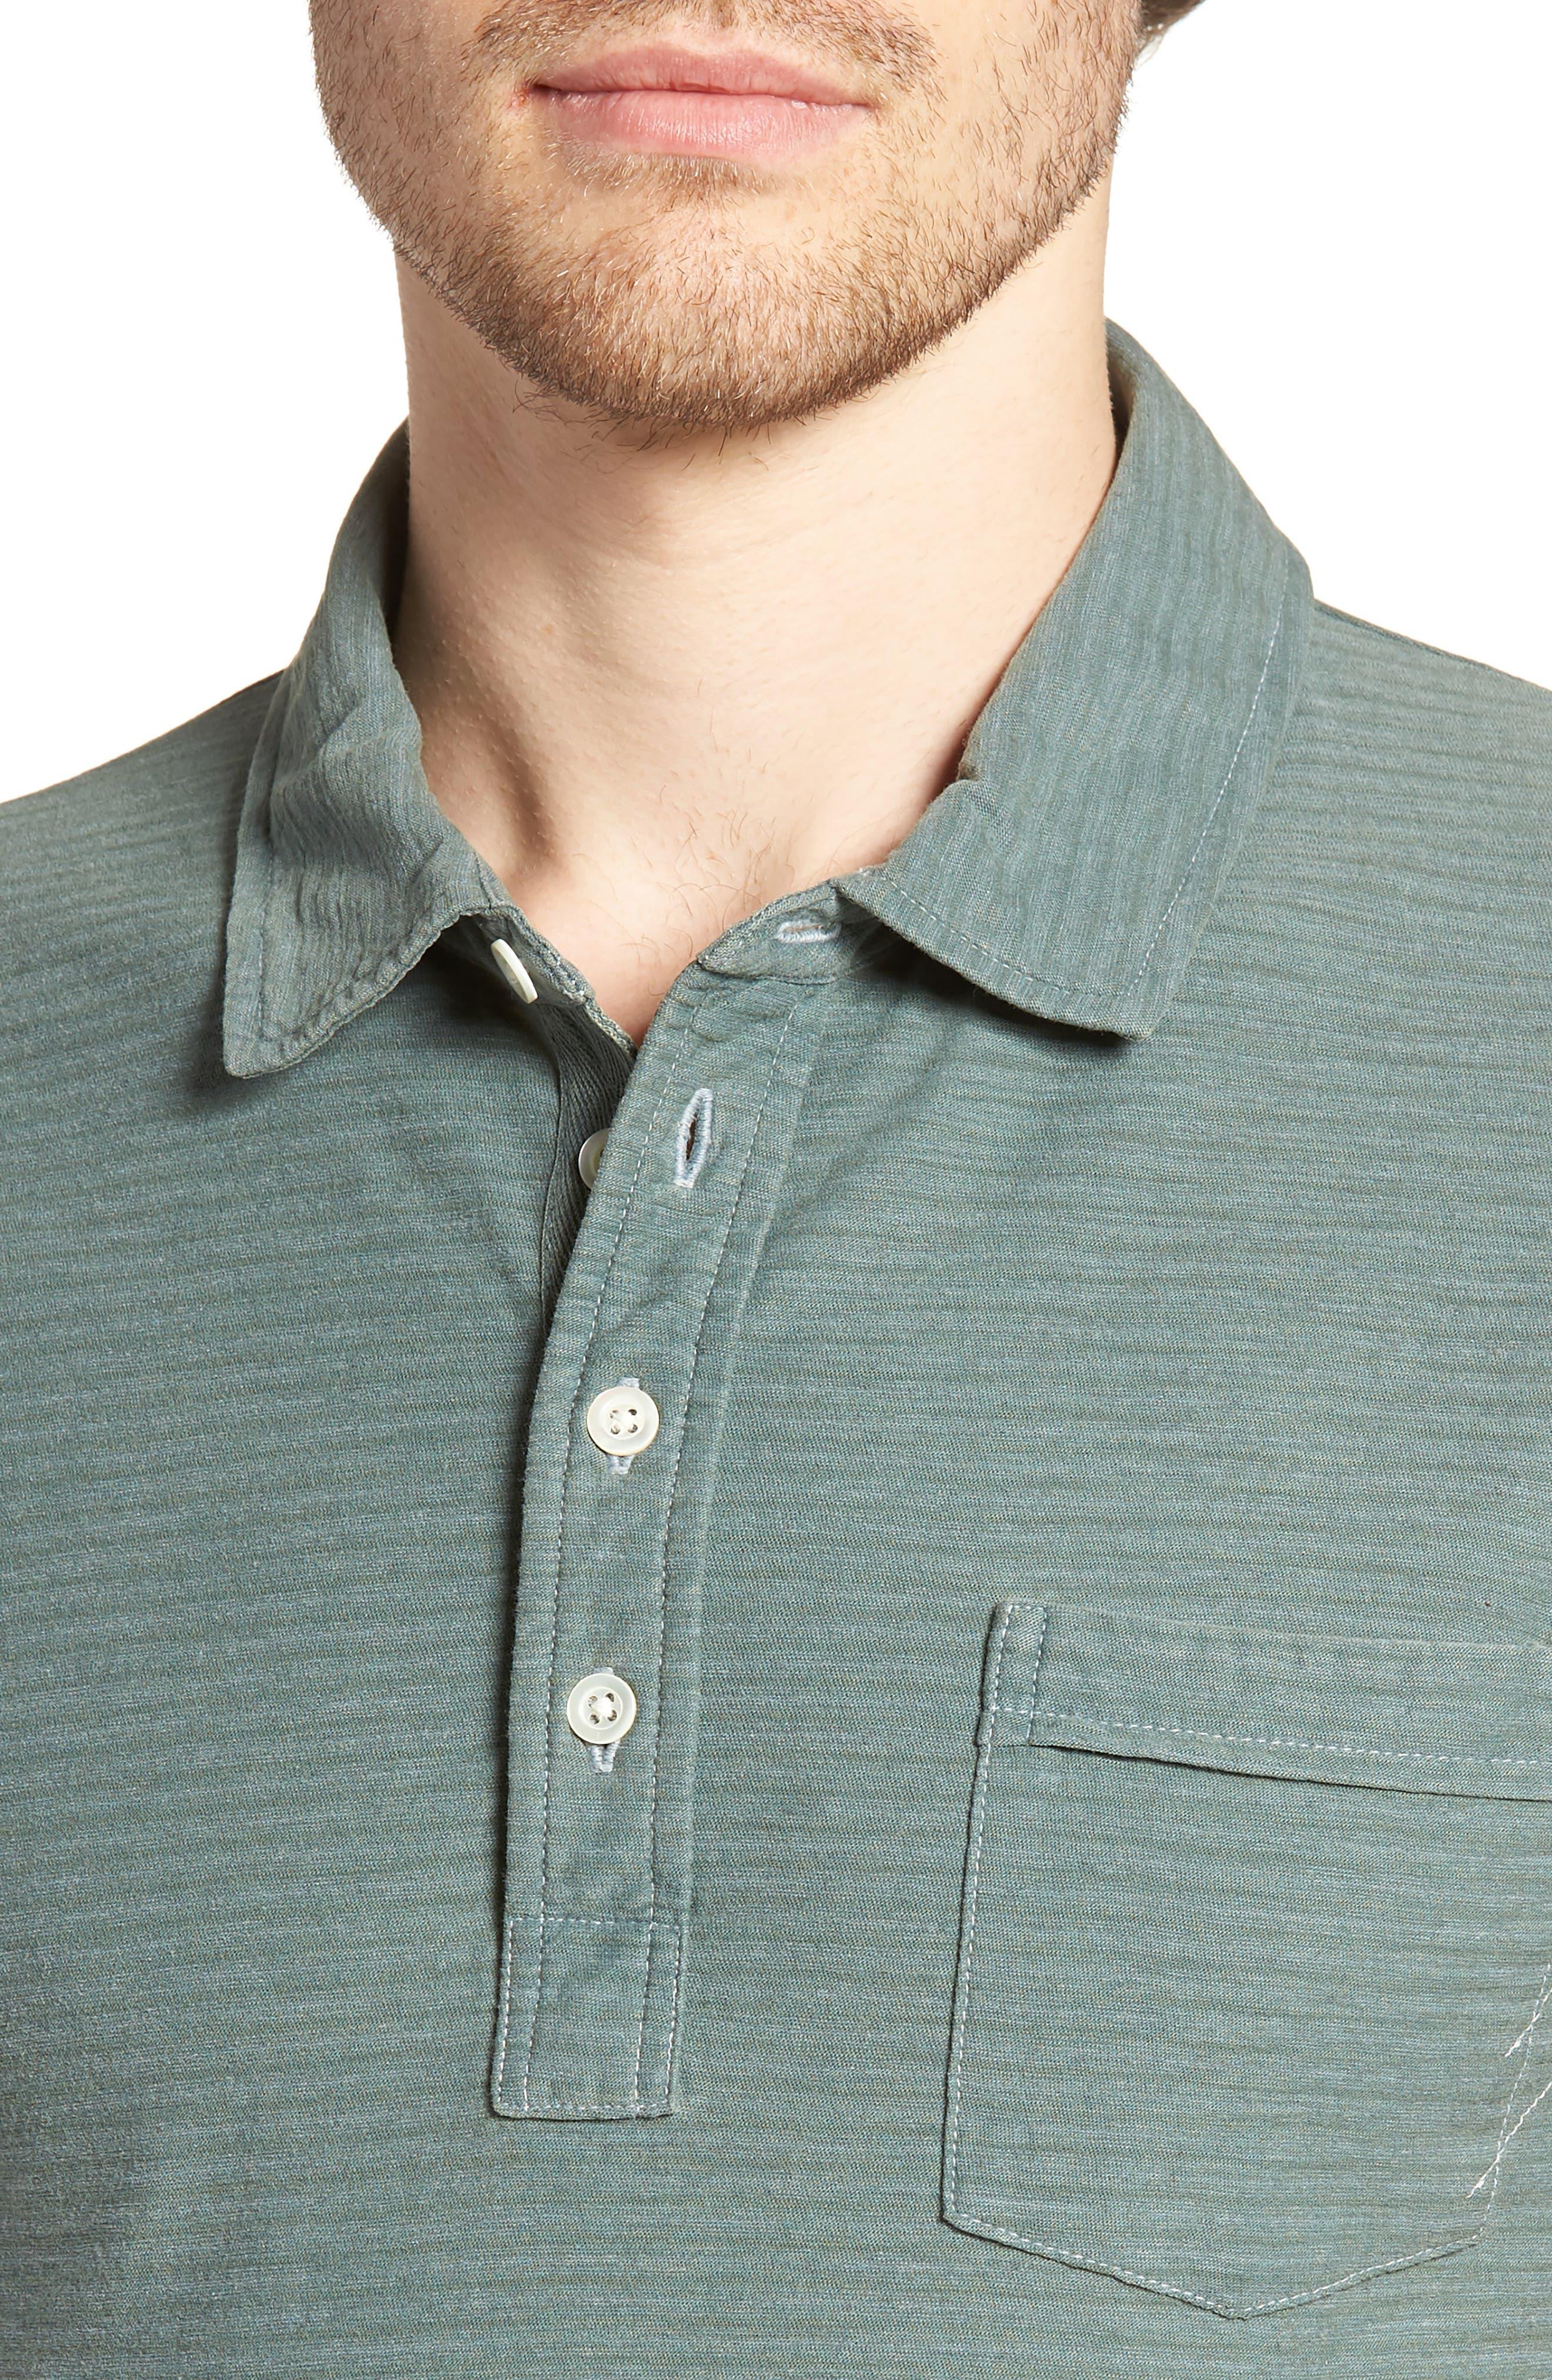 Pensacola Cotton Blend Polo Shirt,                             Alternate thumbnail 4, color,                             SAGE